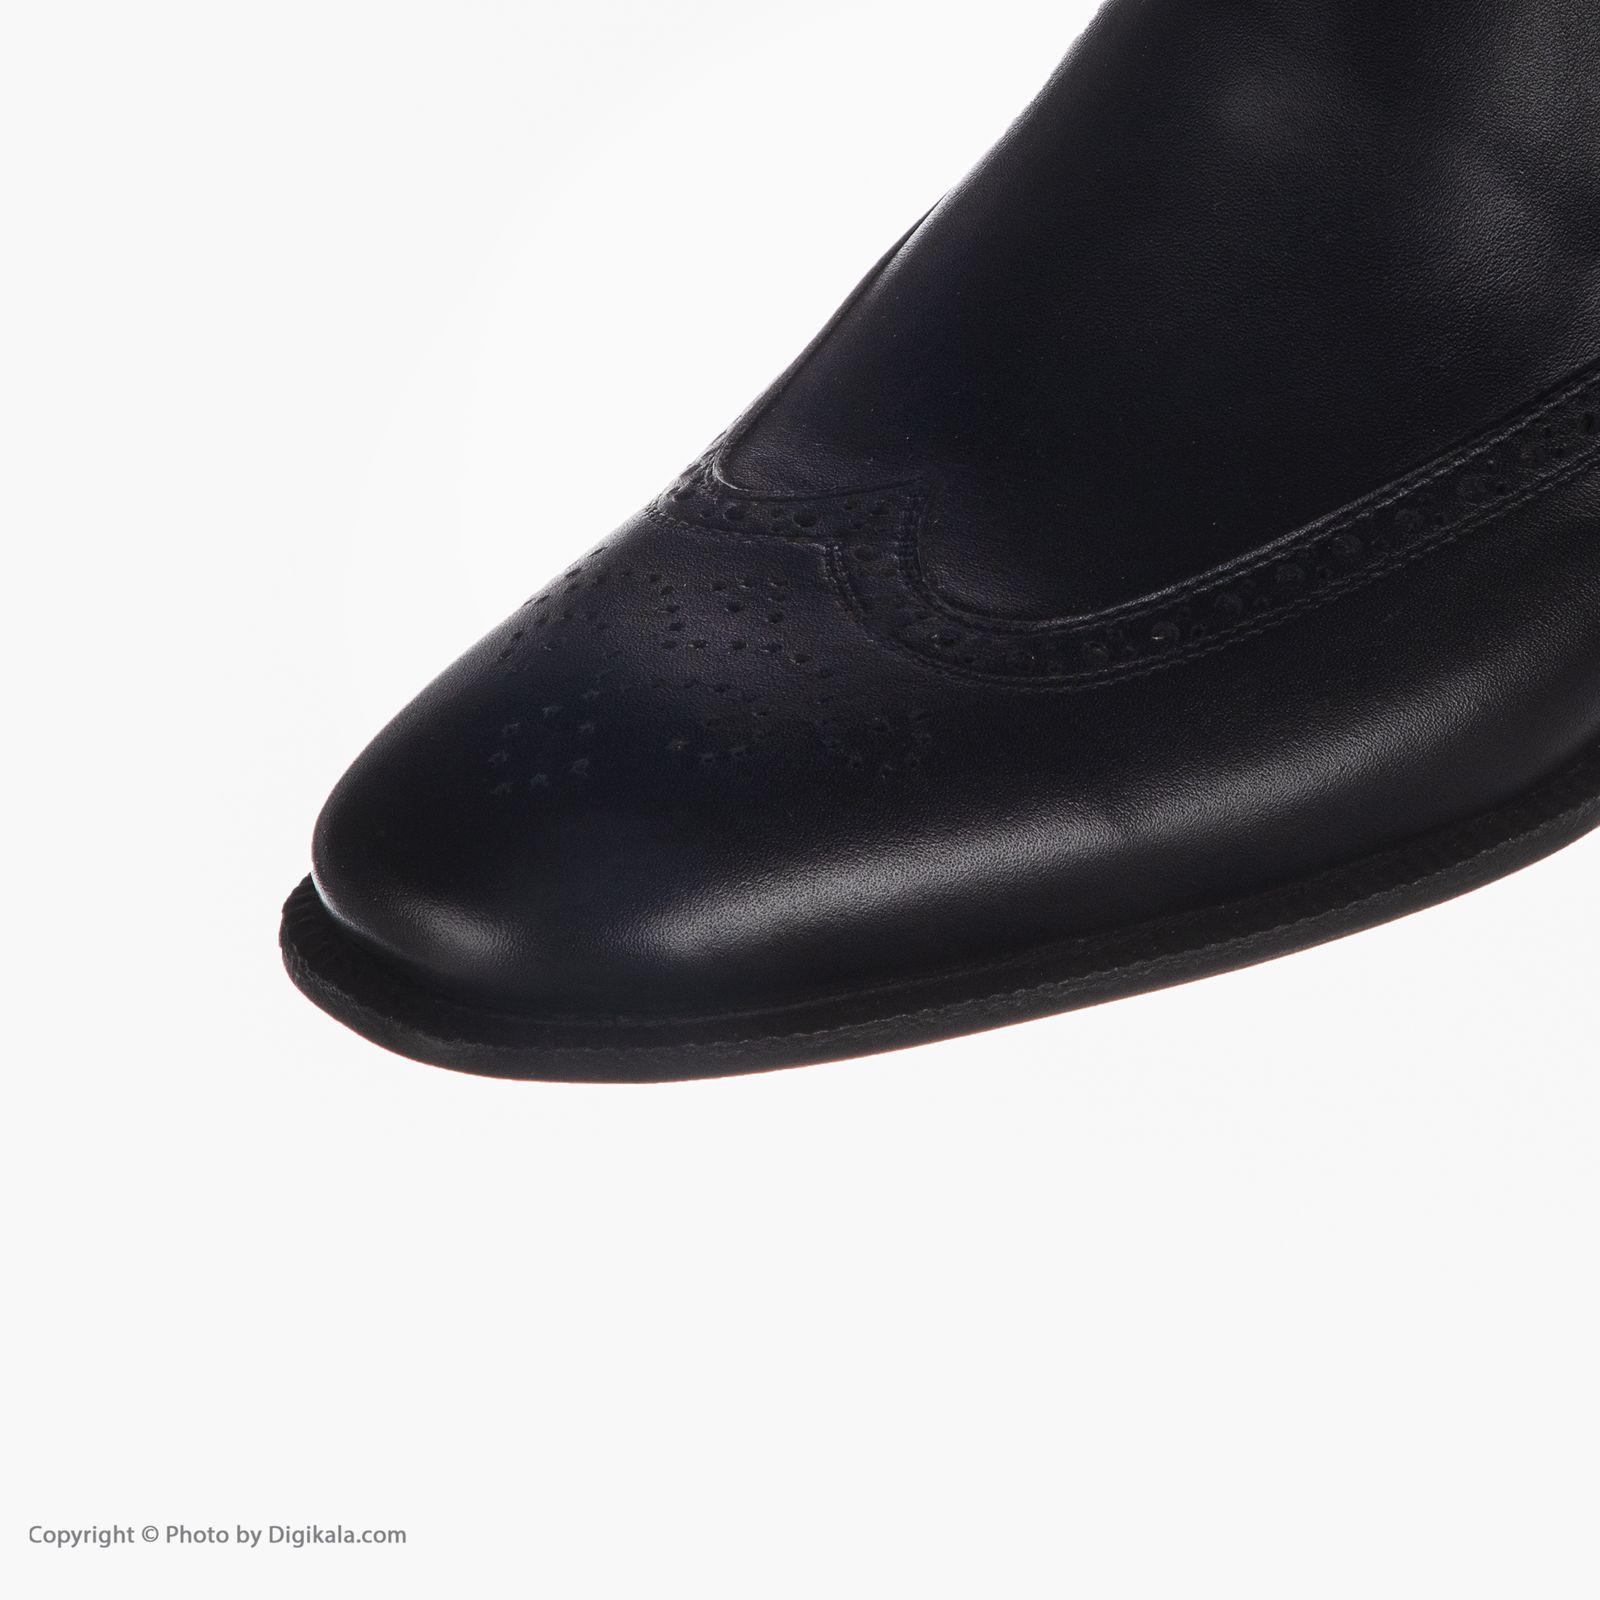 کفش مردانه نظری کد 435 -  - 6